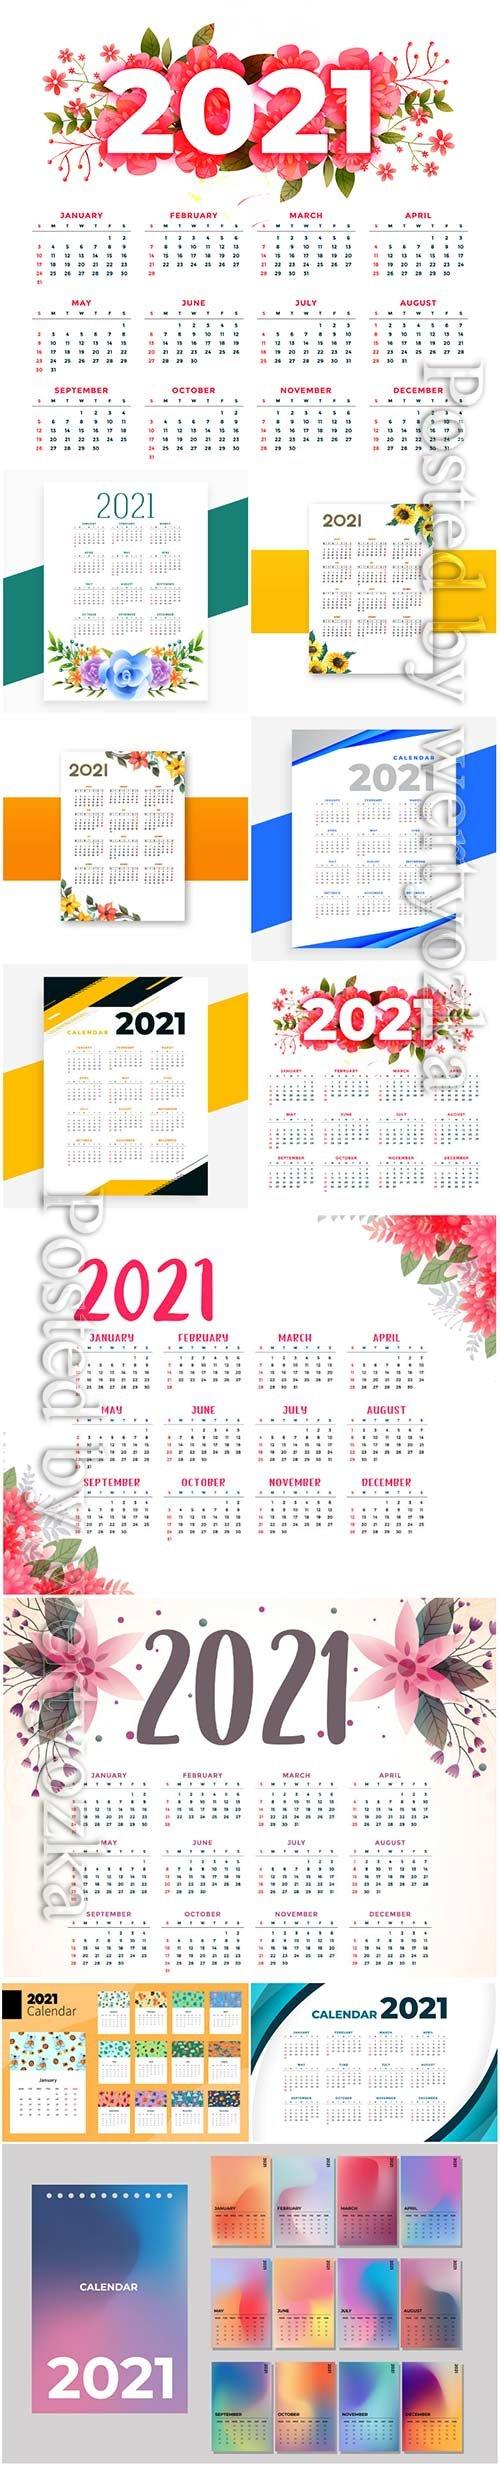 Flower style 2021 beautiful calendar template